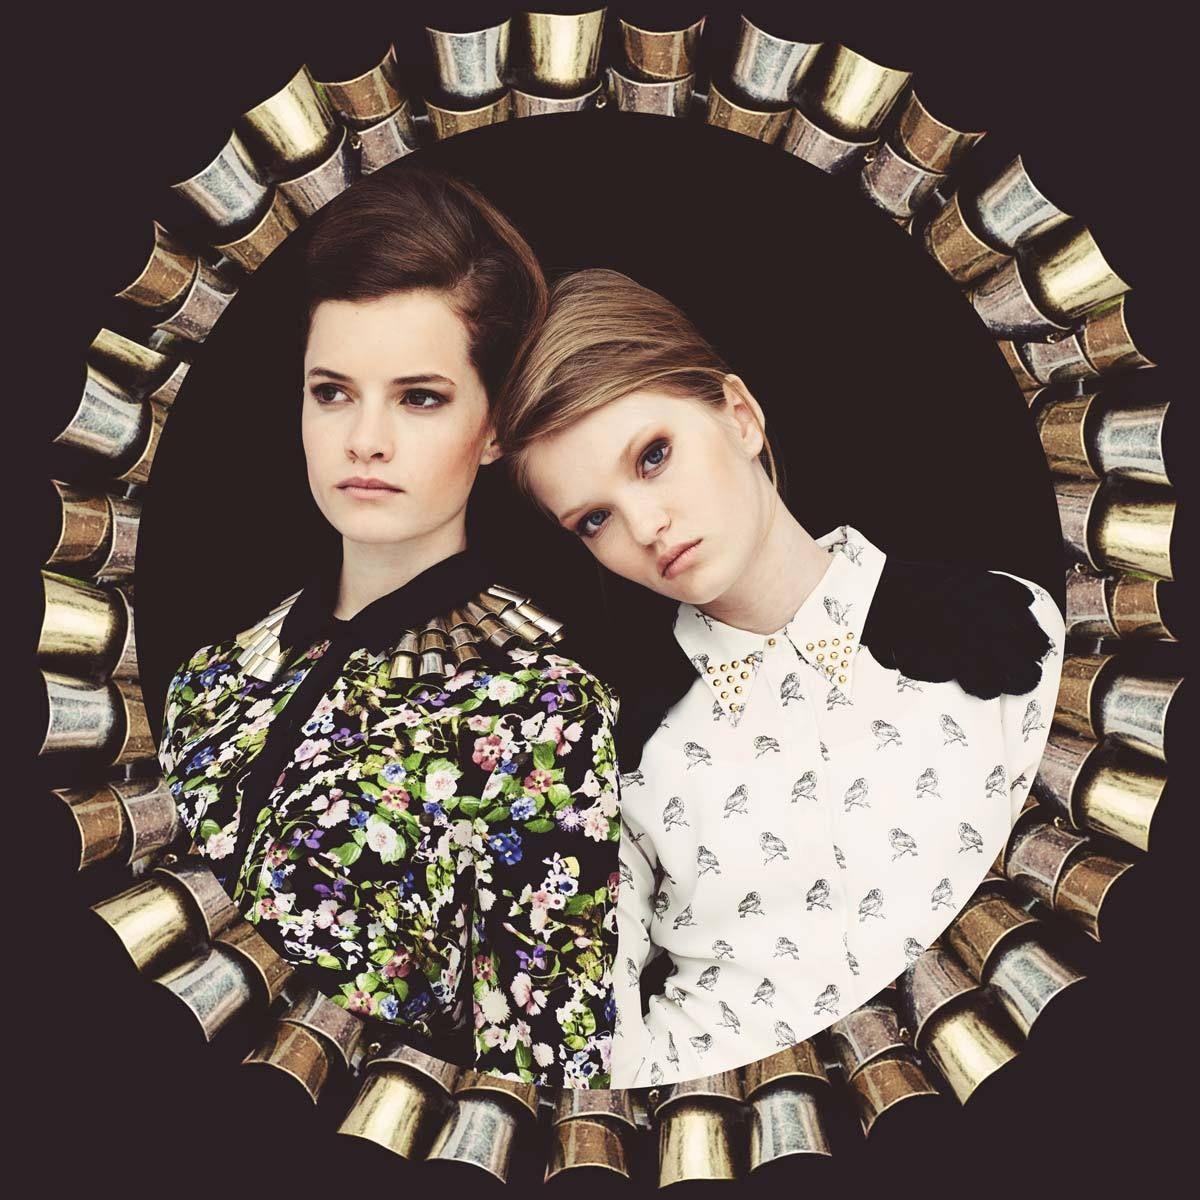 Models: Bridget  & Abby Williamson